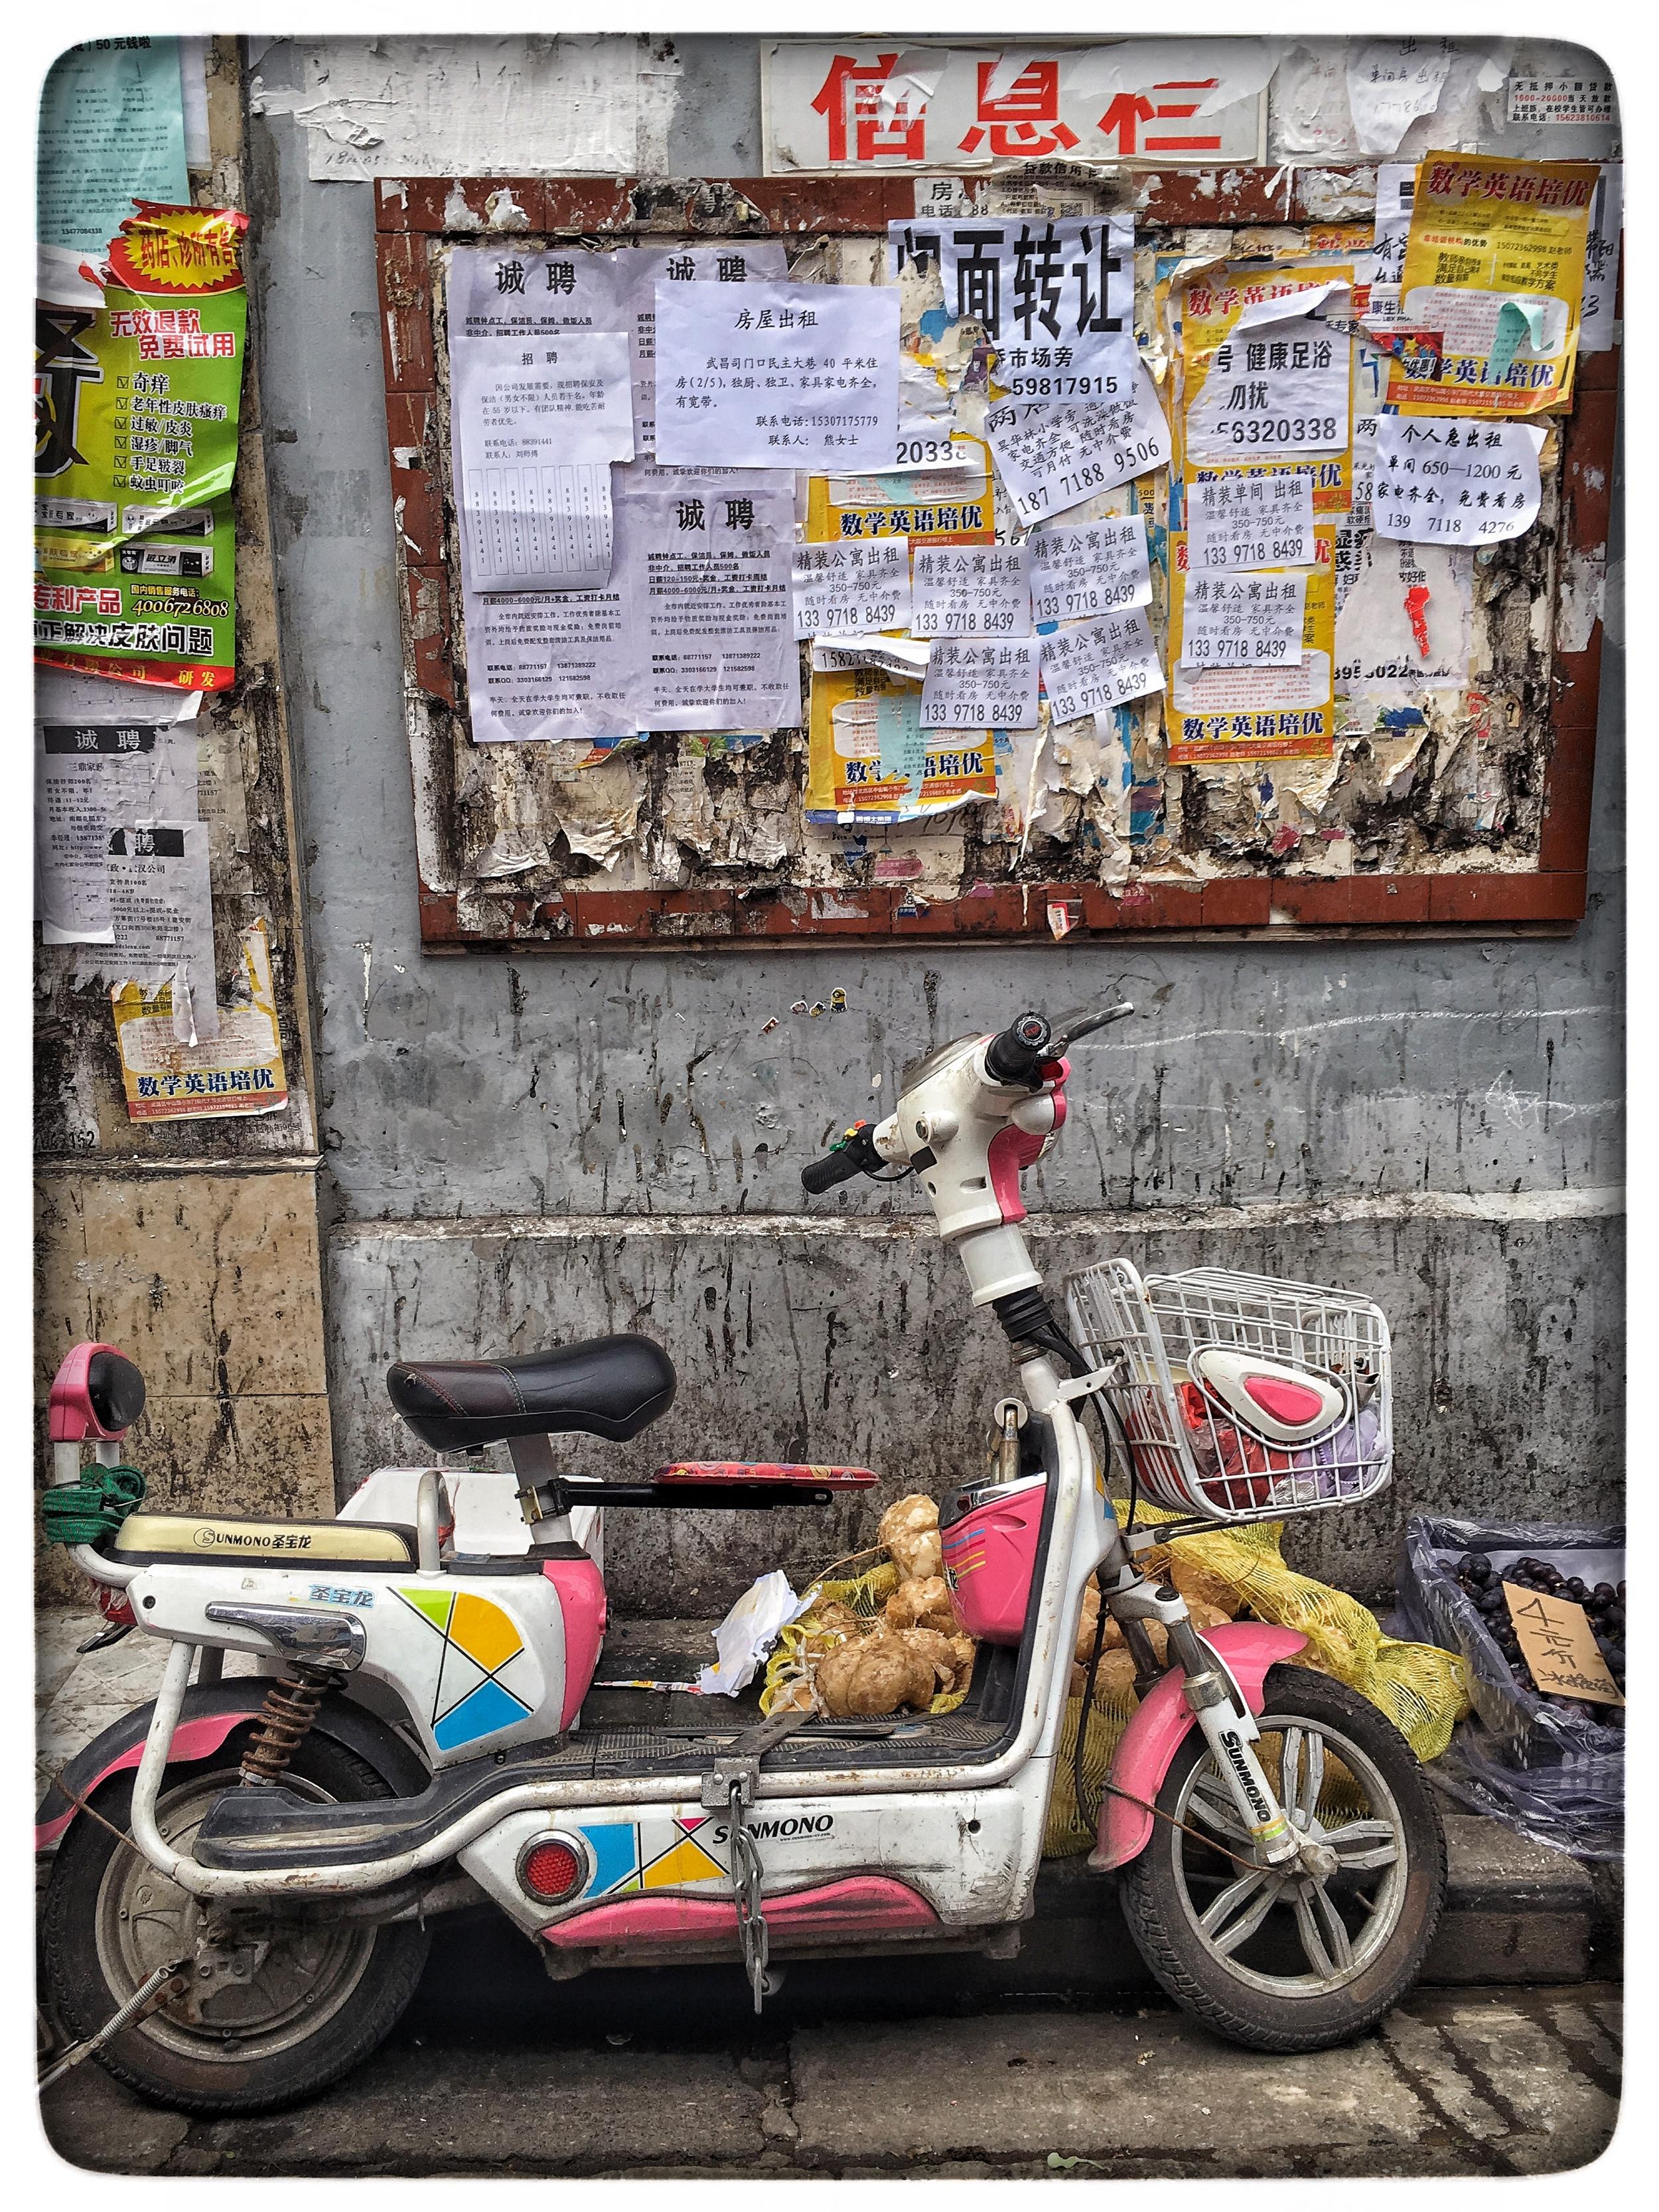 Wuhan alley